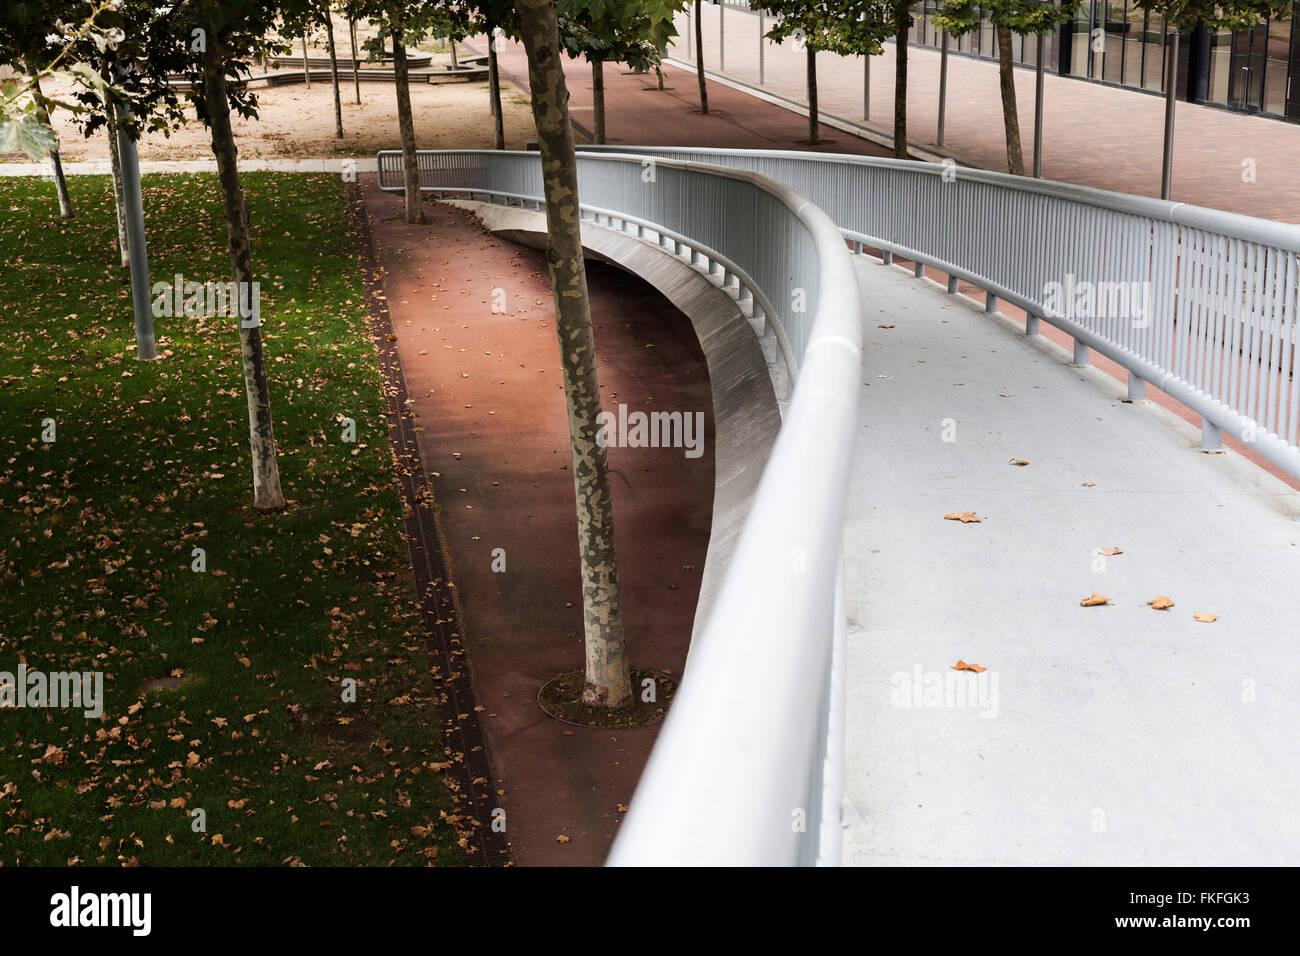 Parc del Forum, Barcelona. - Stock Image